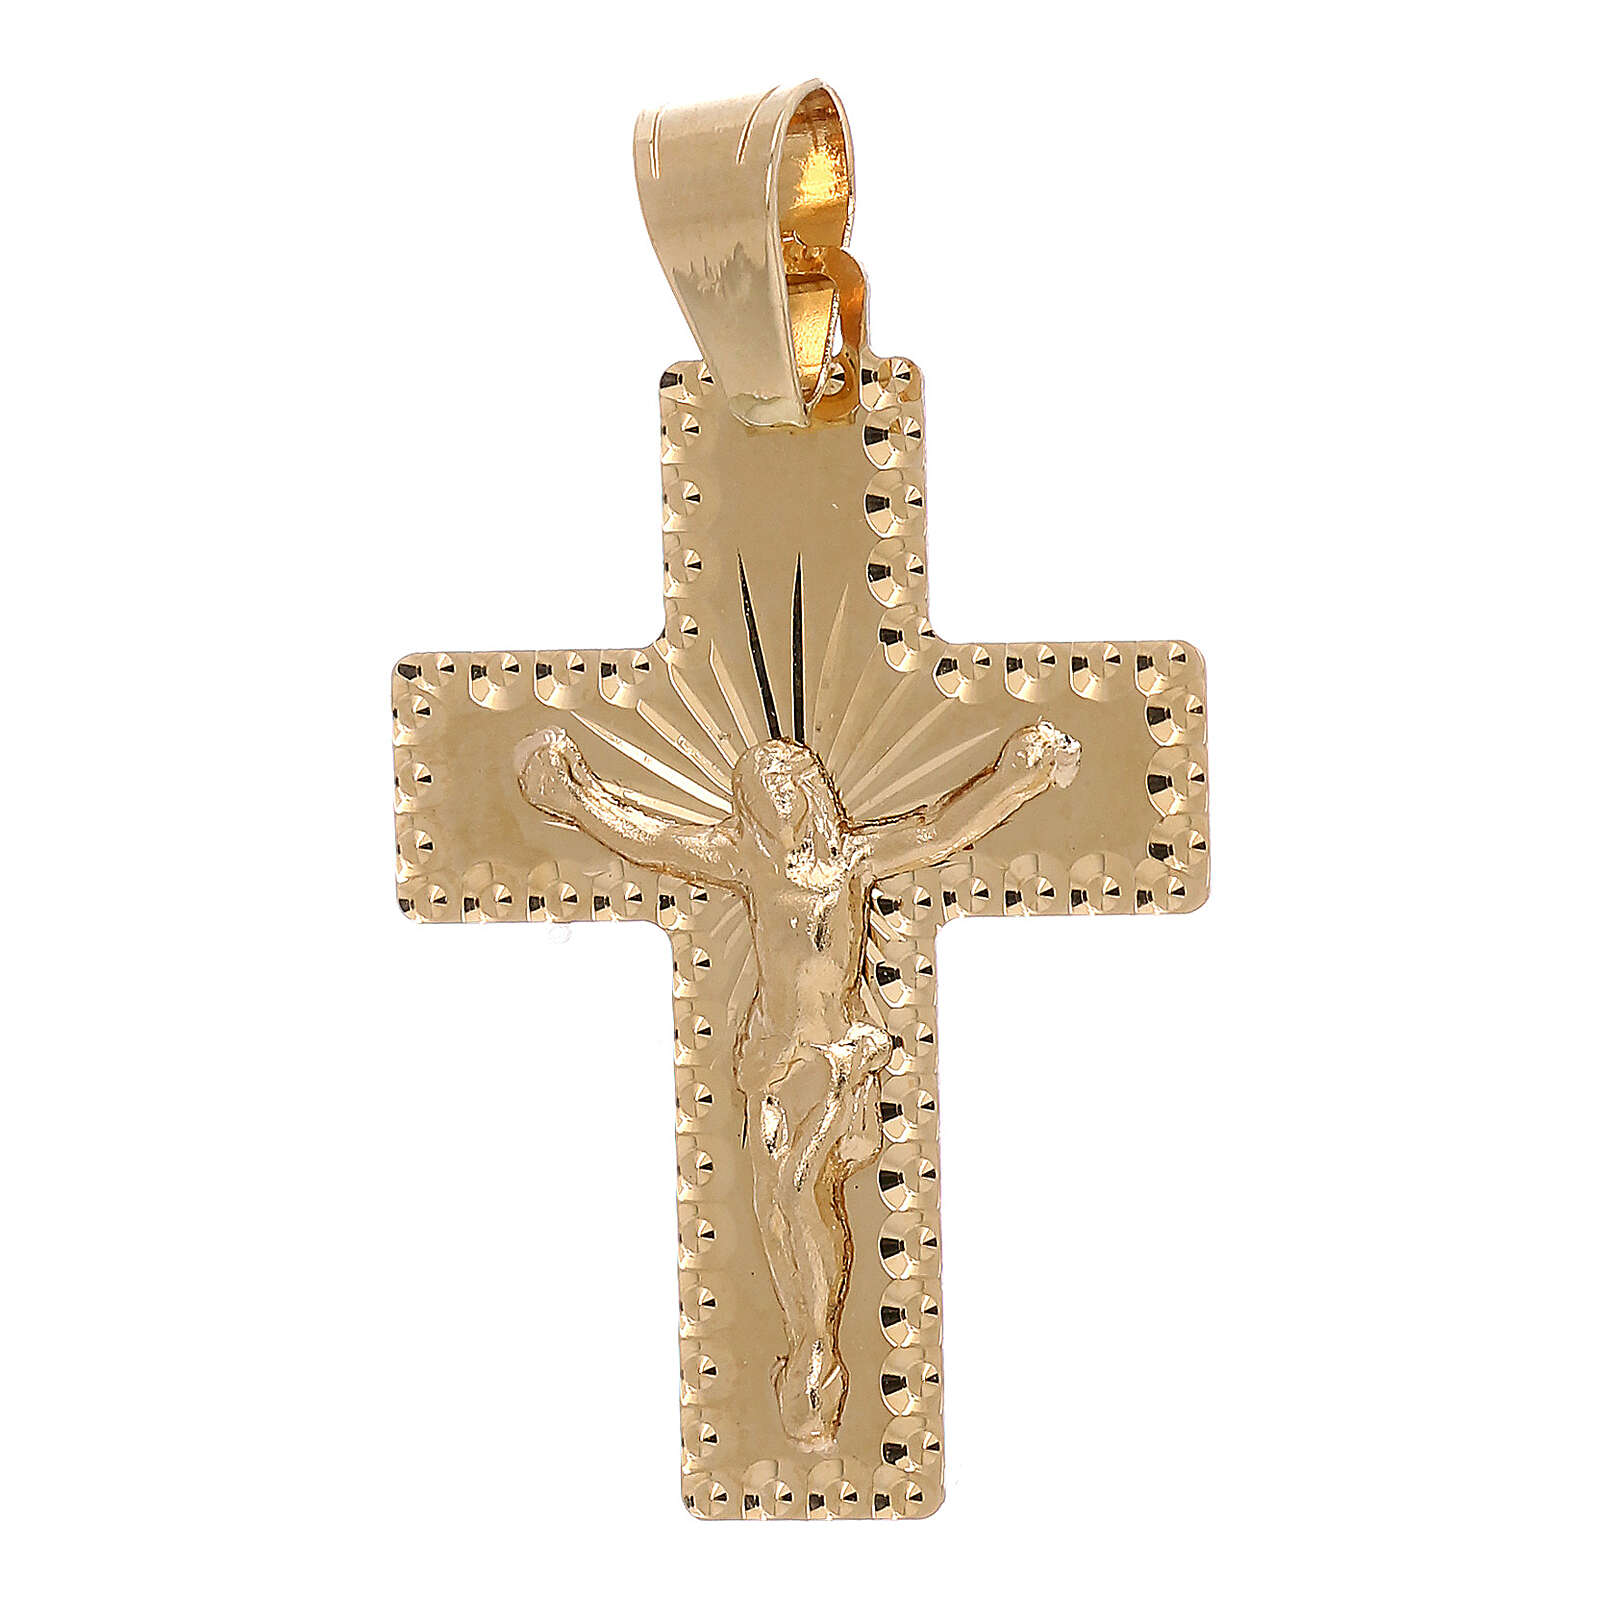 Cruz colgante escuadrada Cristo rayos oro 18 quilates 1 gr 4